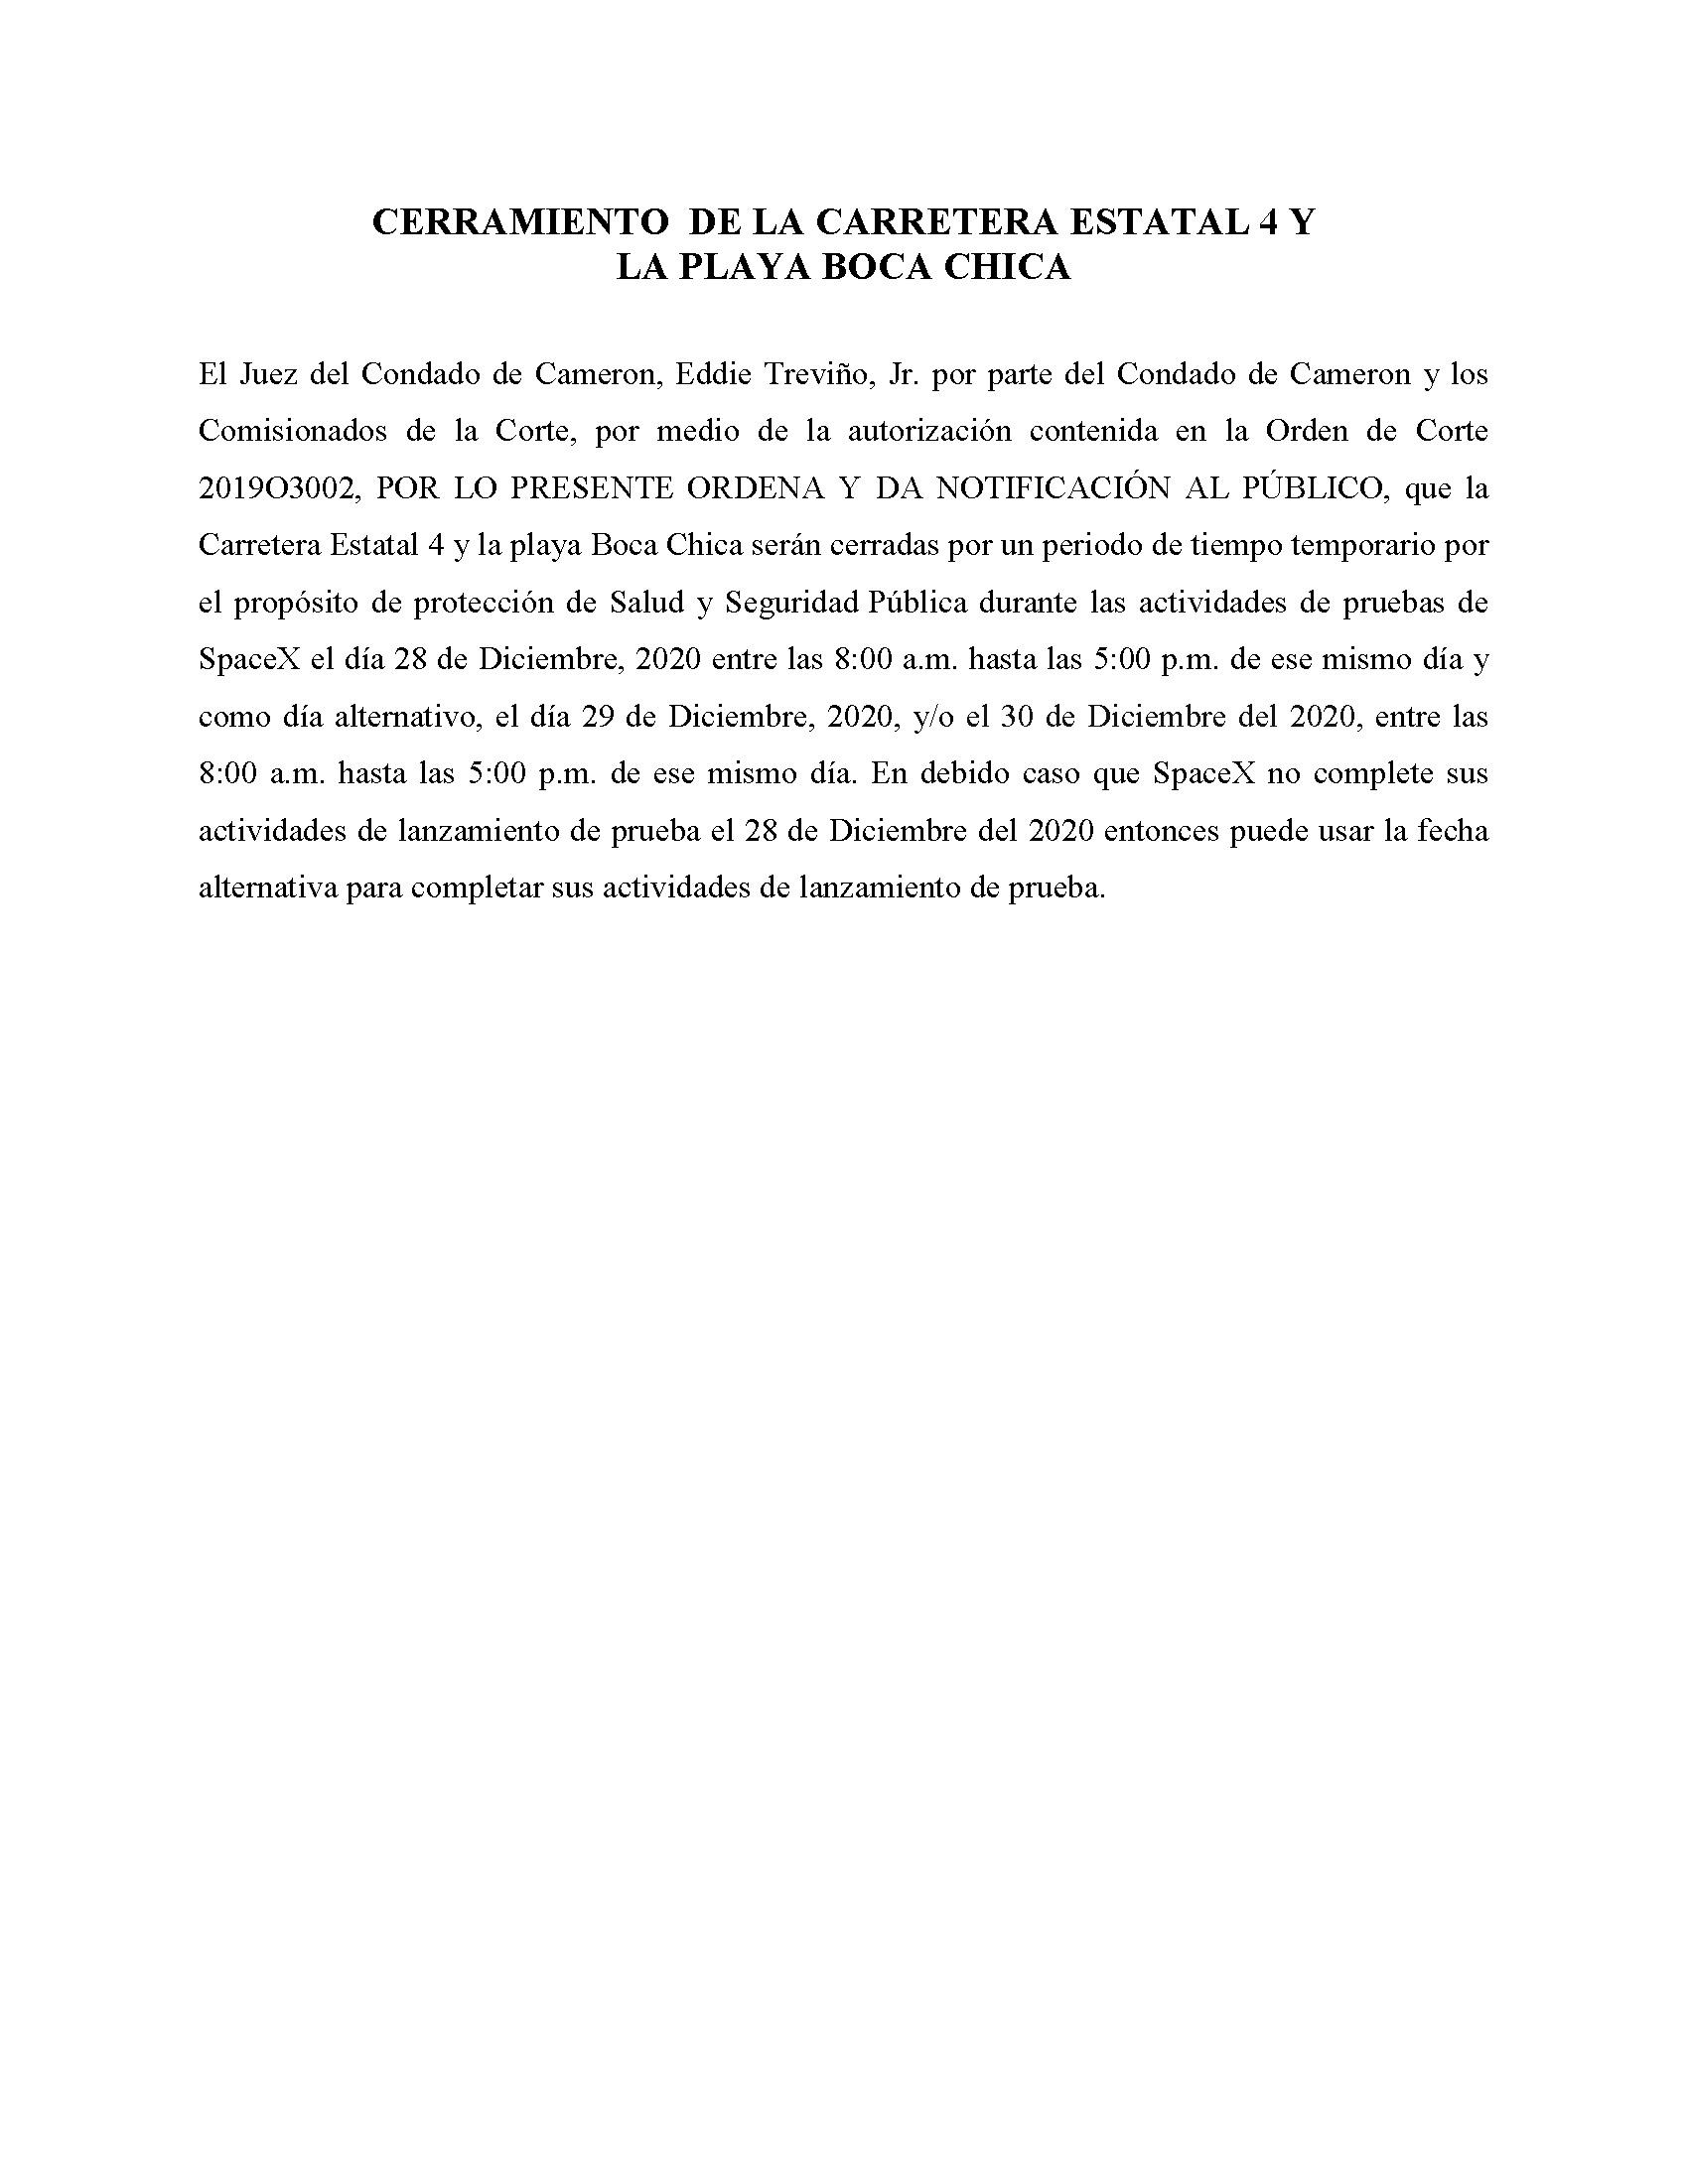 ORDER.CLOSURE OF HIGHWAY 4 Y LA PLAYA BOCA CHICA.SPANISH.12.28.20